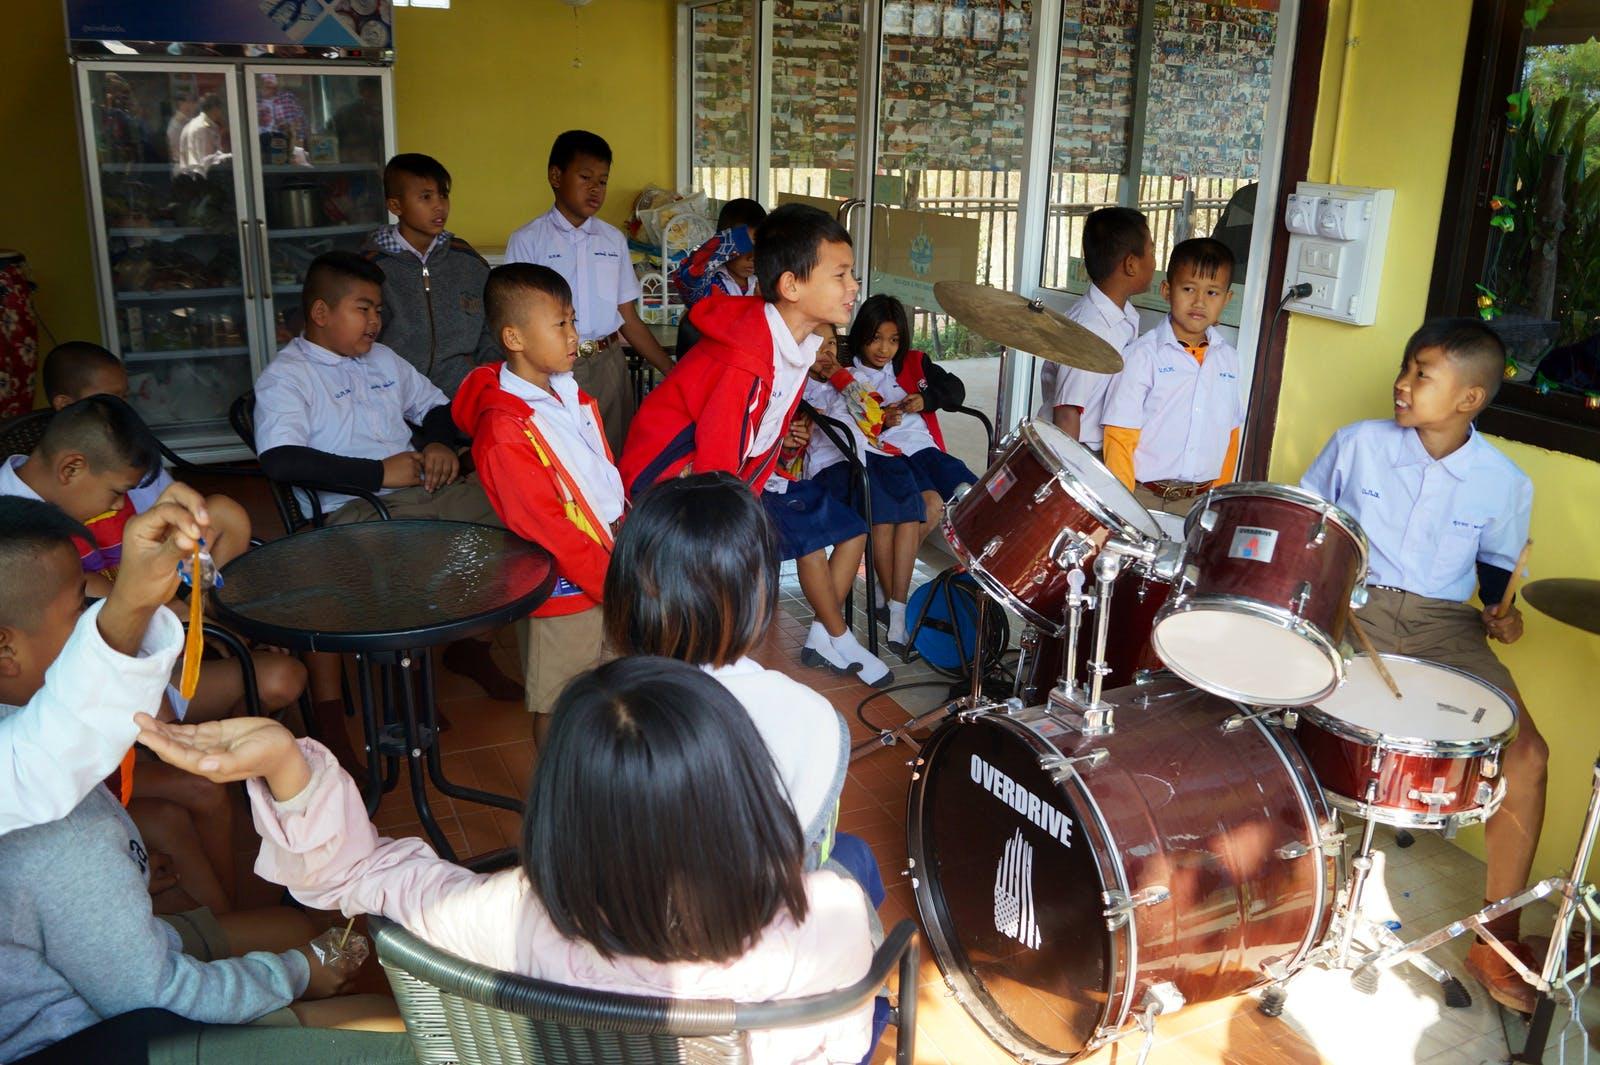 Teach children music at temple schools